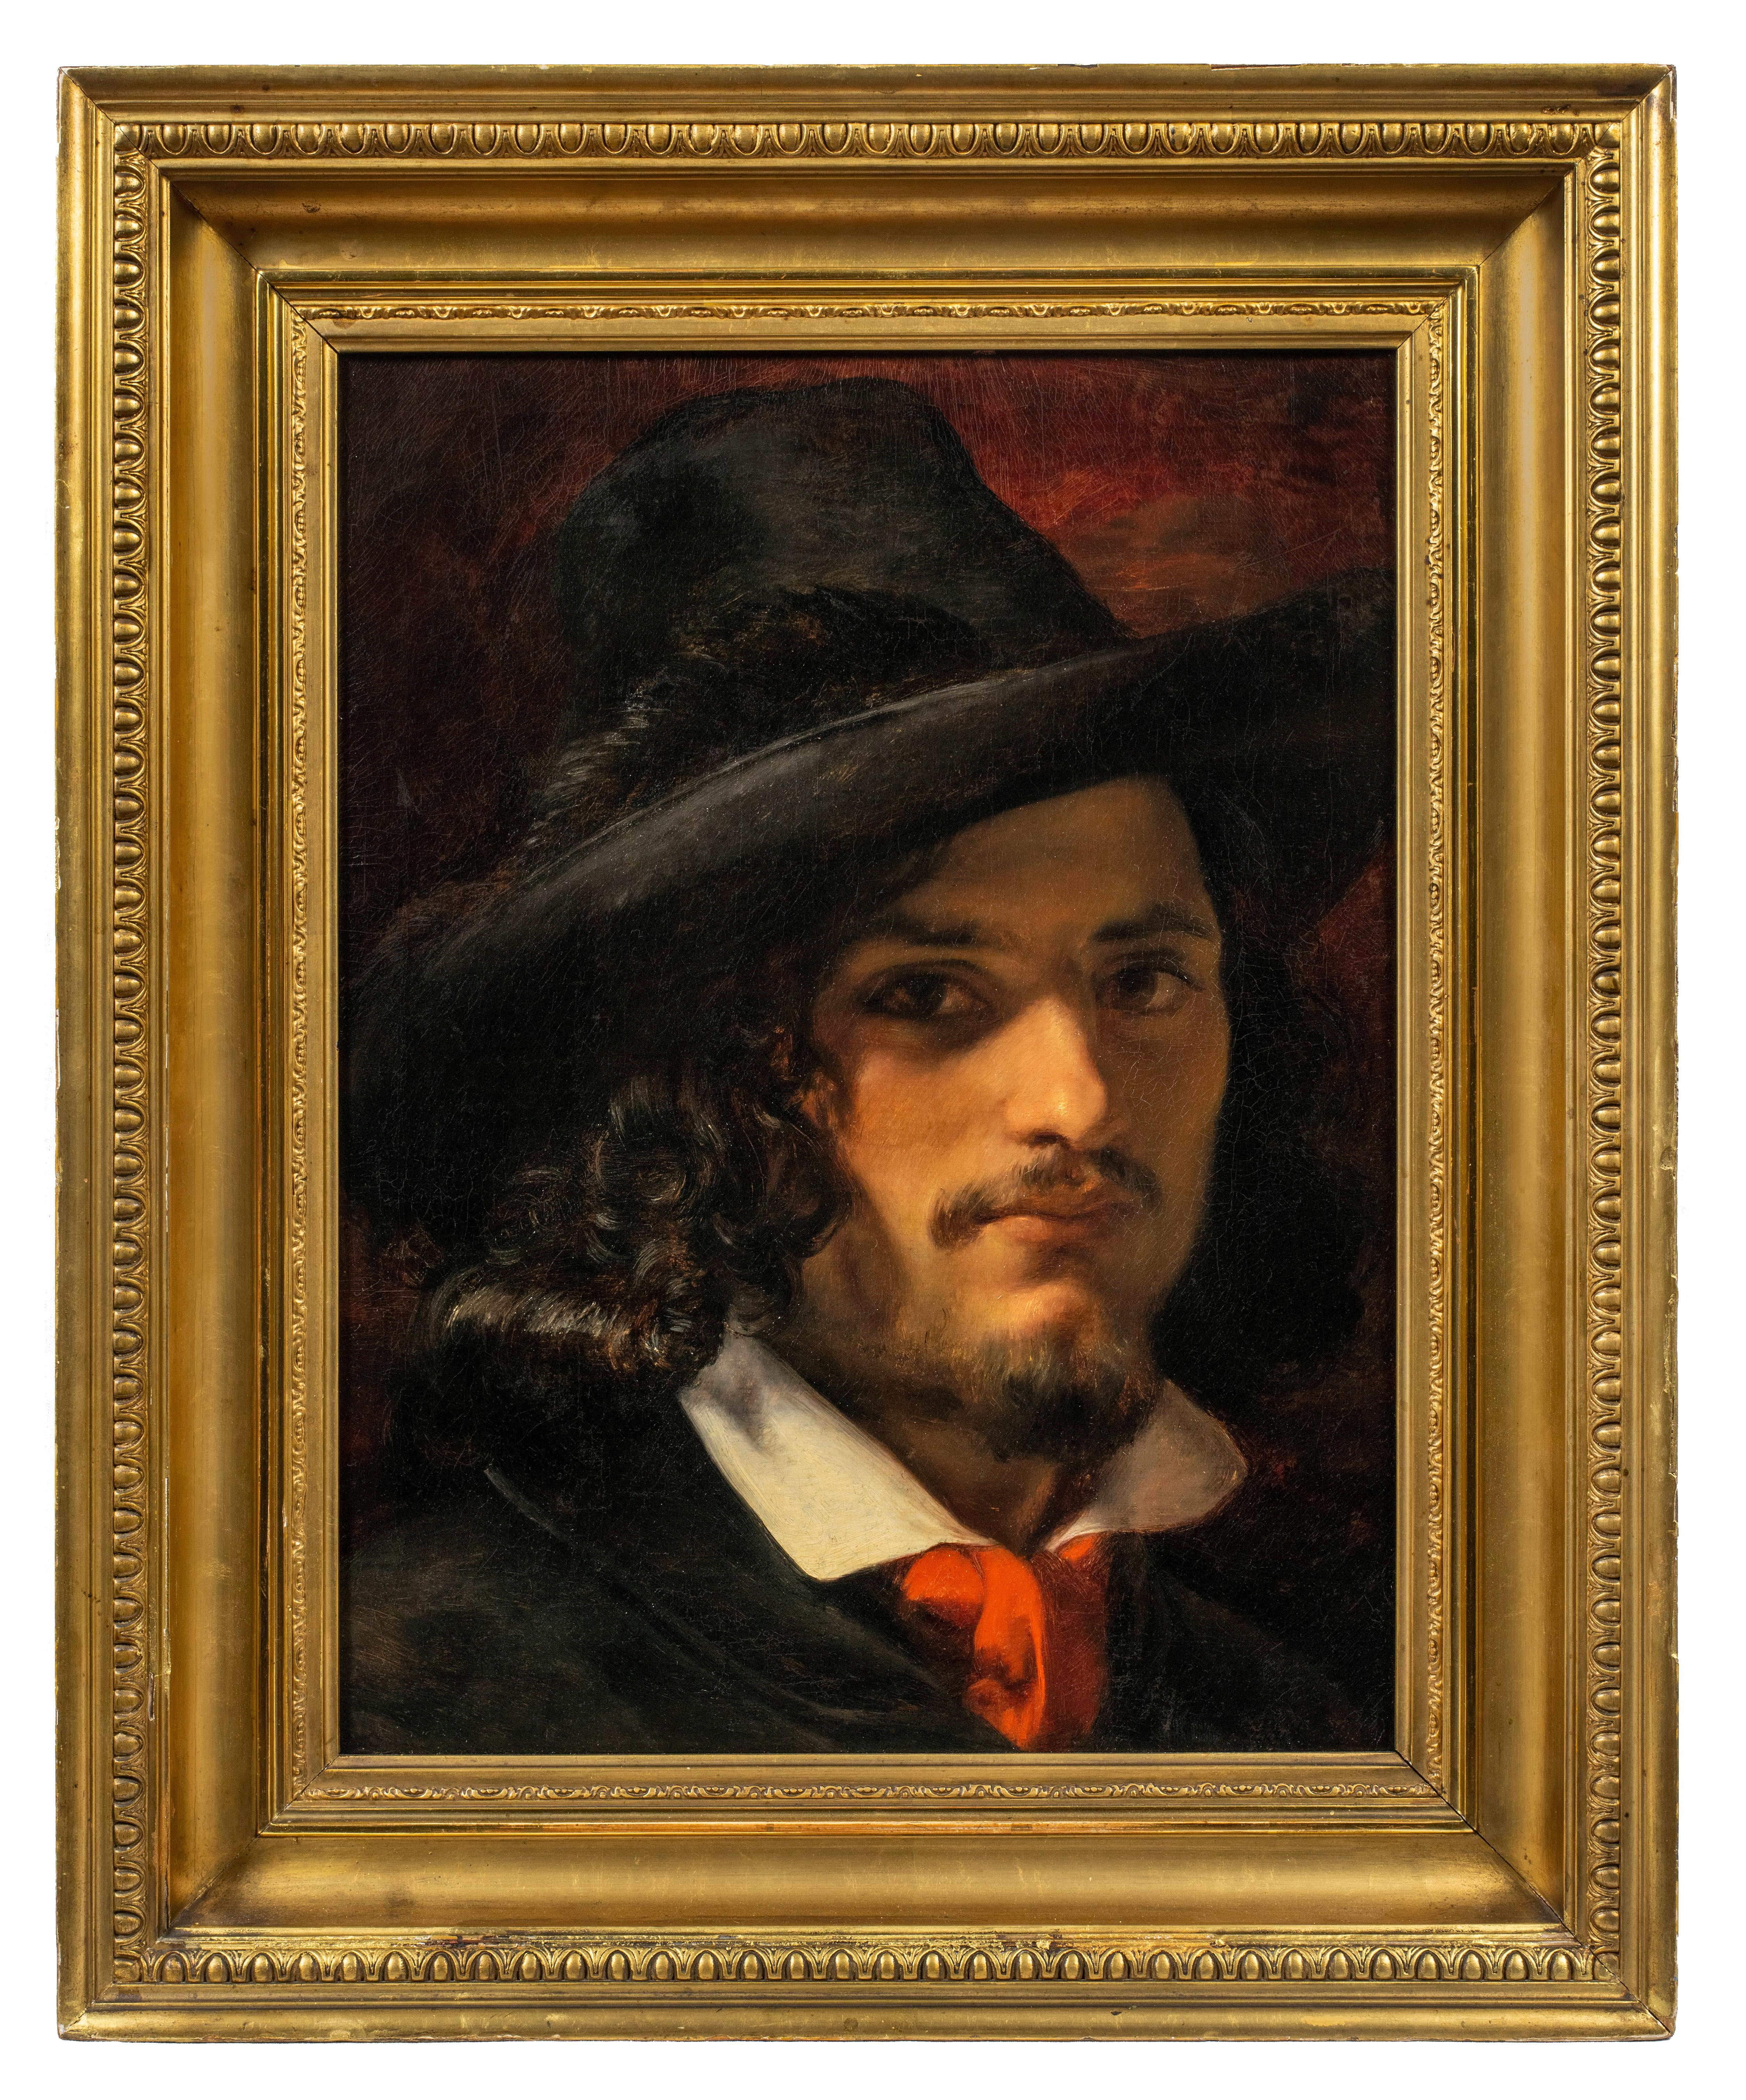 Portrait of an Italian Revolutionary